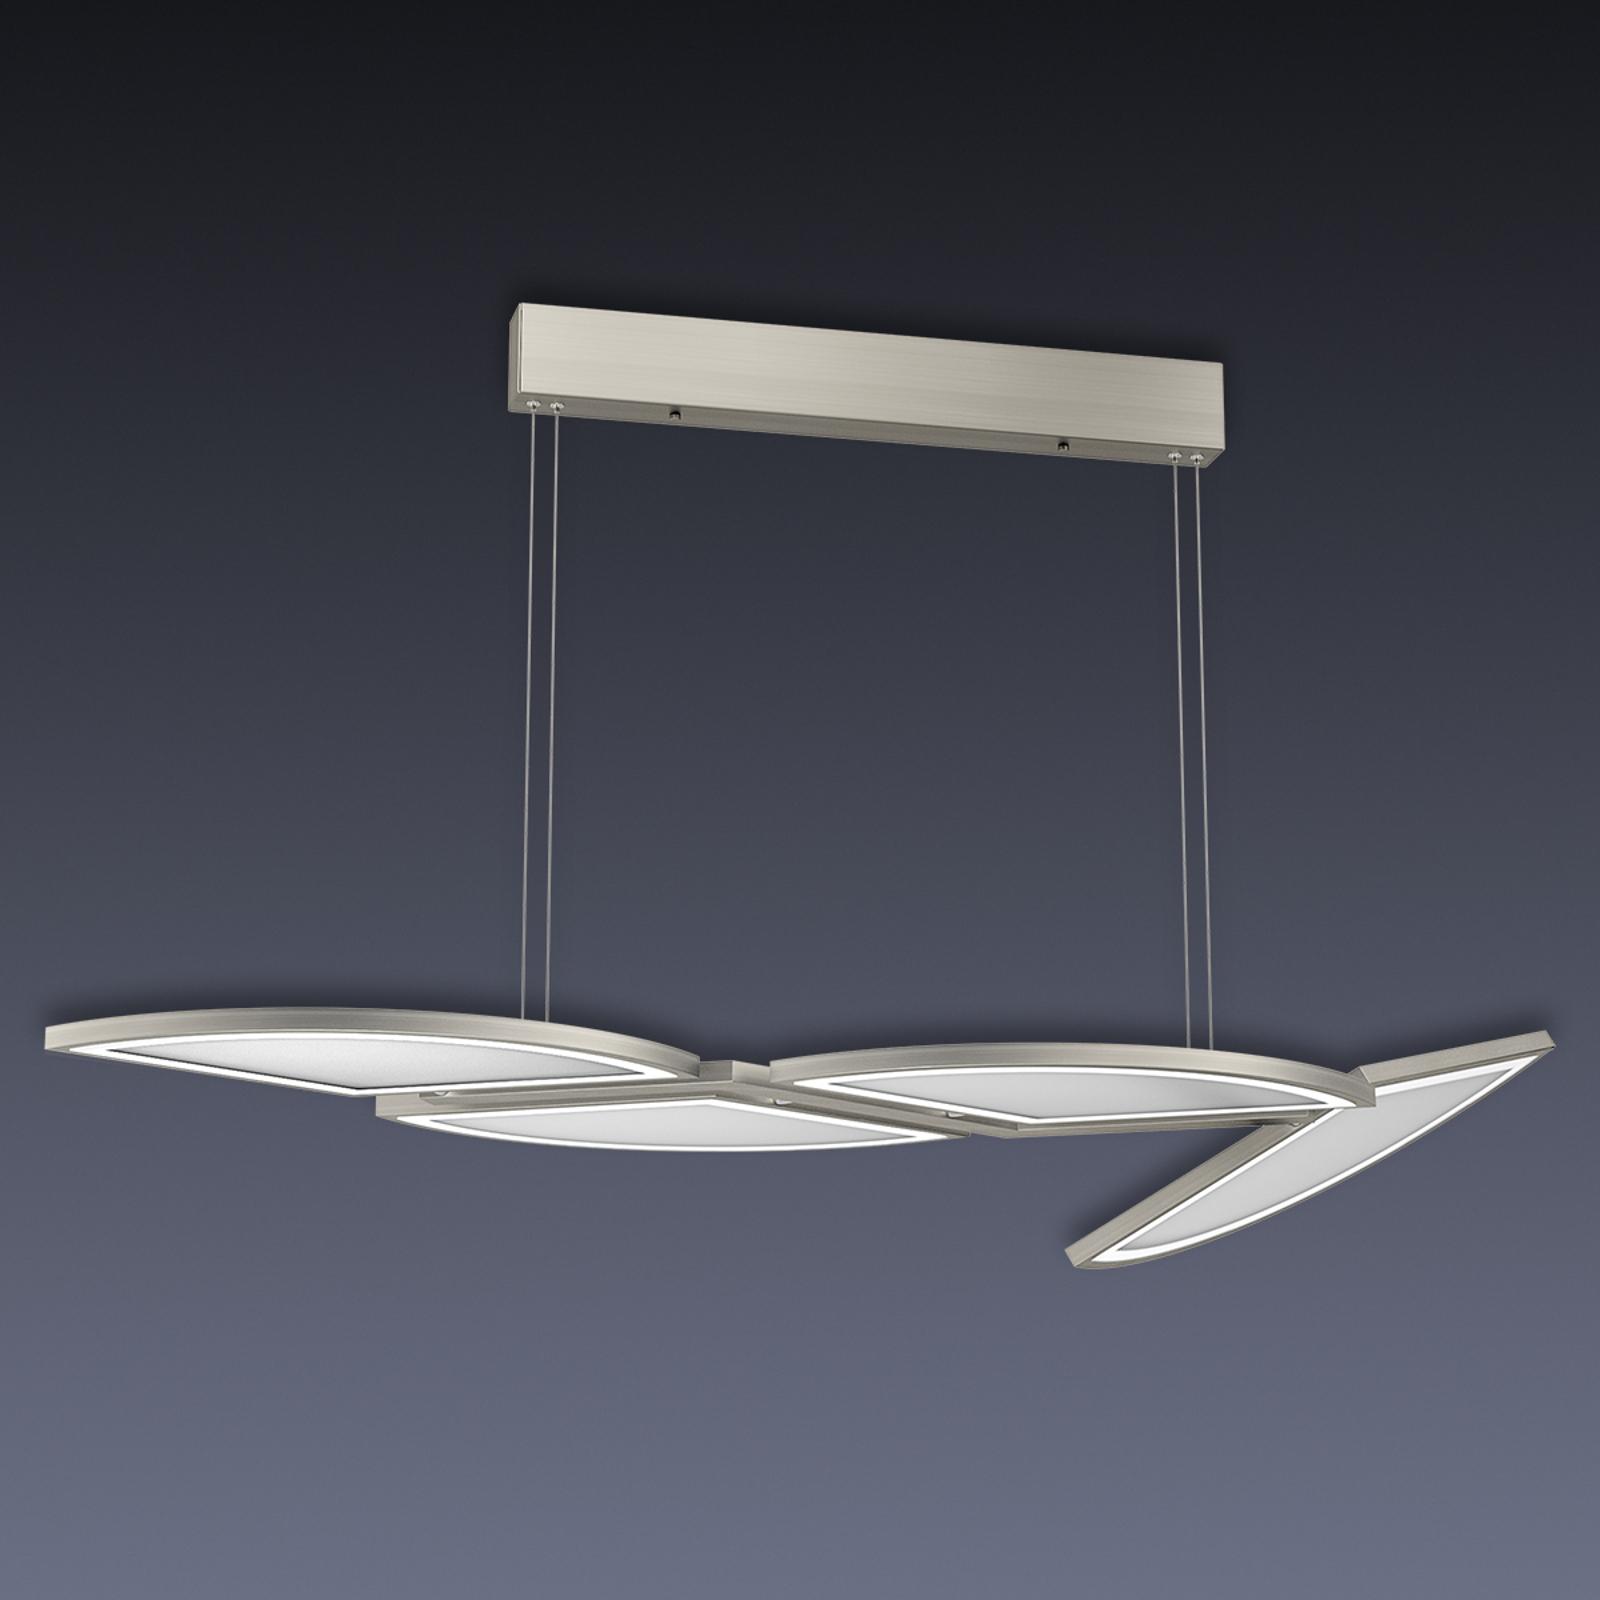 Movil LED-pendellampe med fire lyskilder